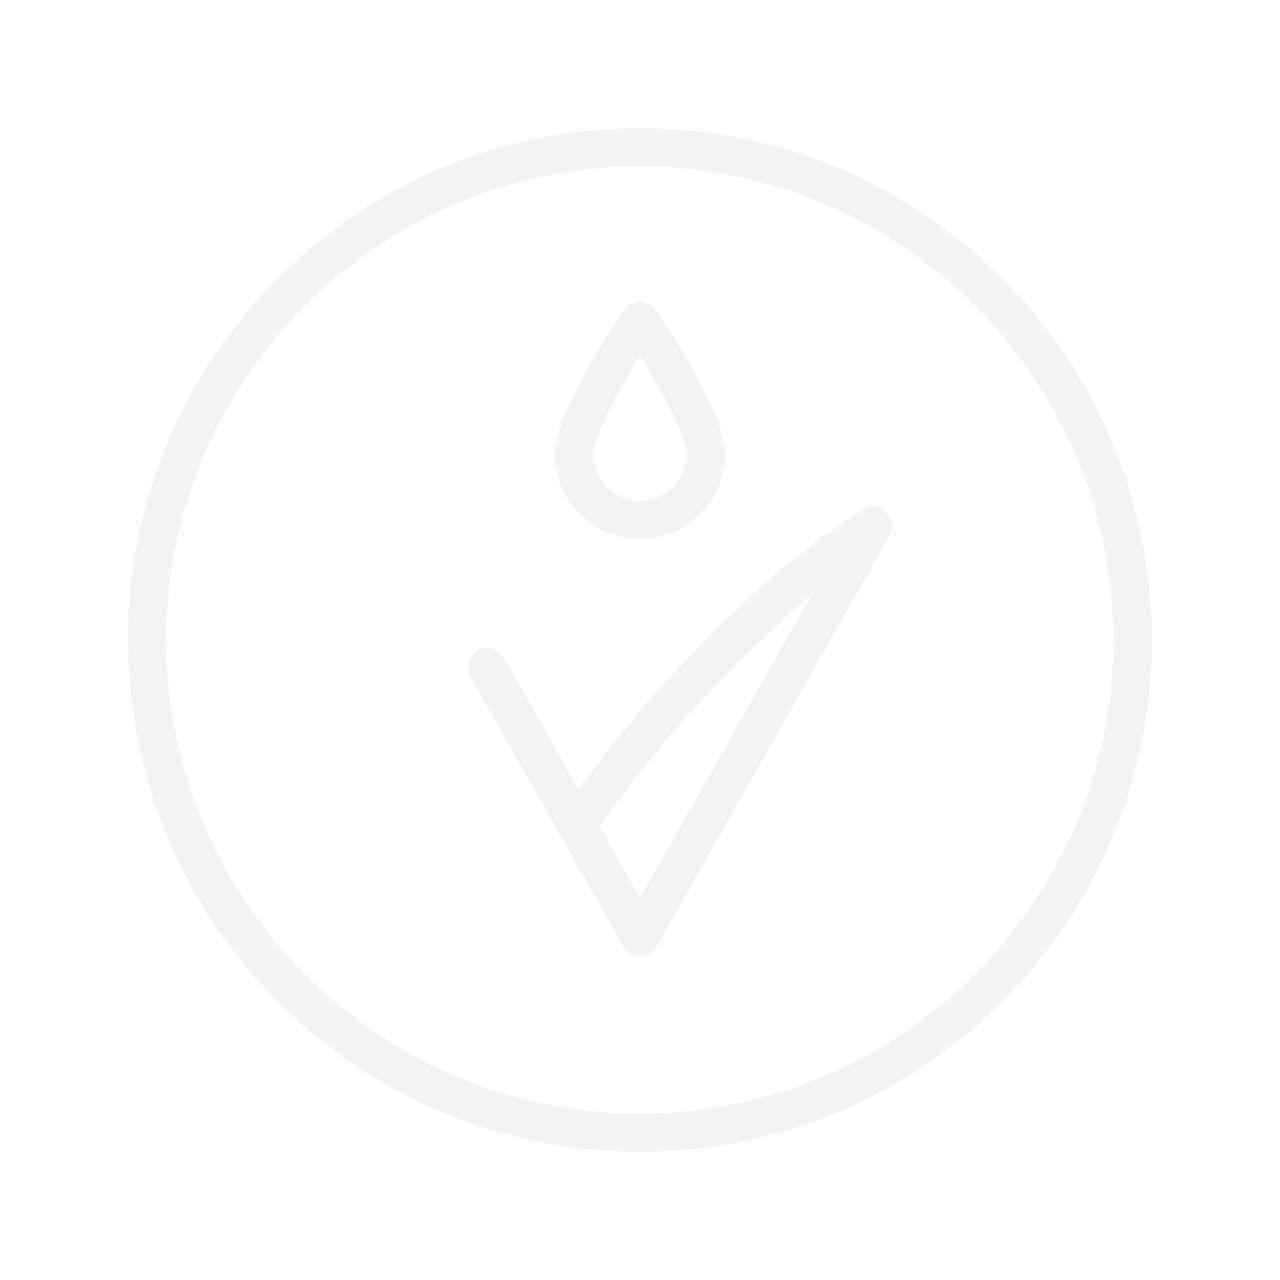 ALESSANDRO Striplac Nail Polish No.109 Sinful Glow 8ml